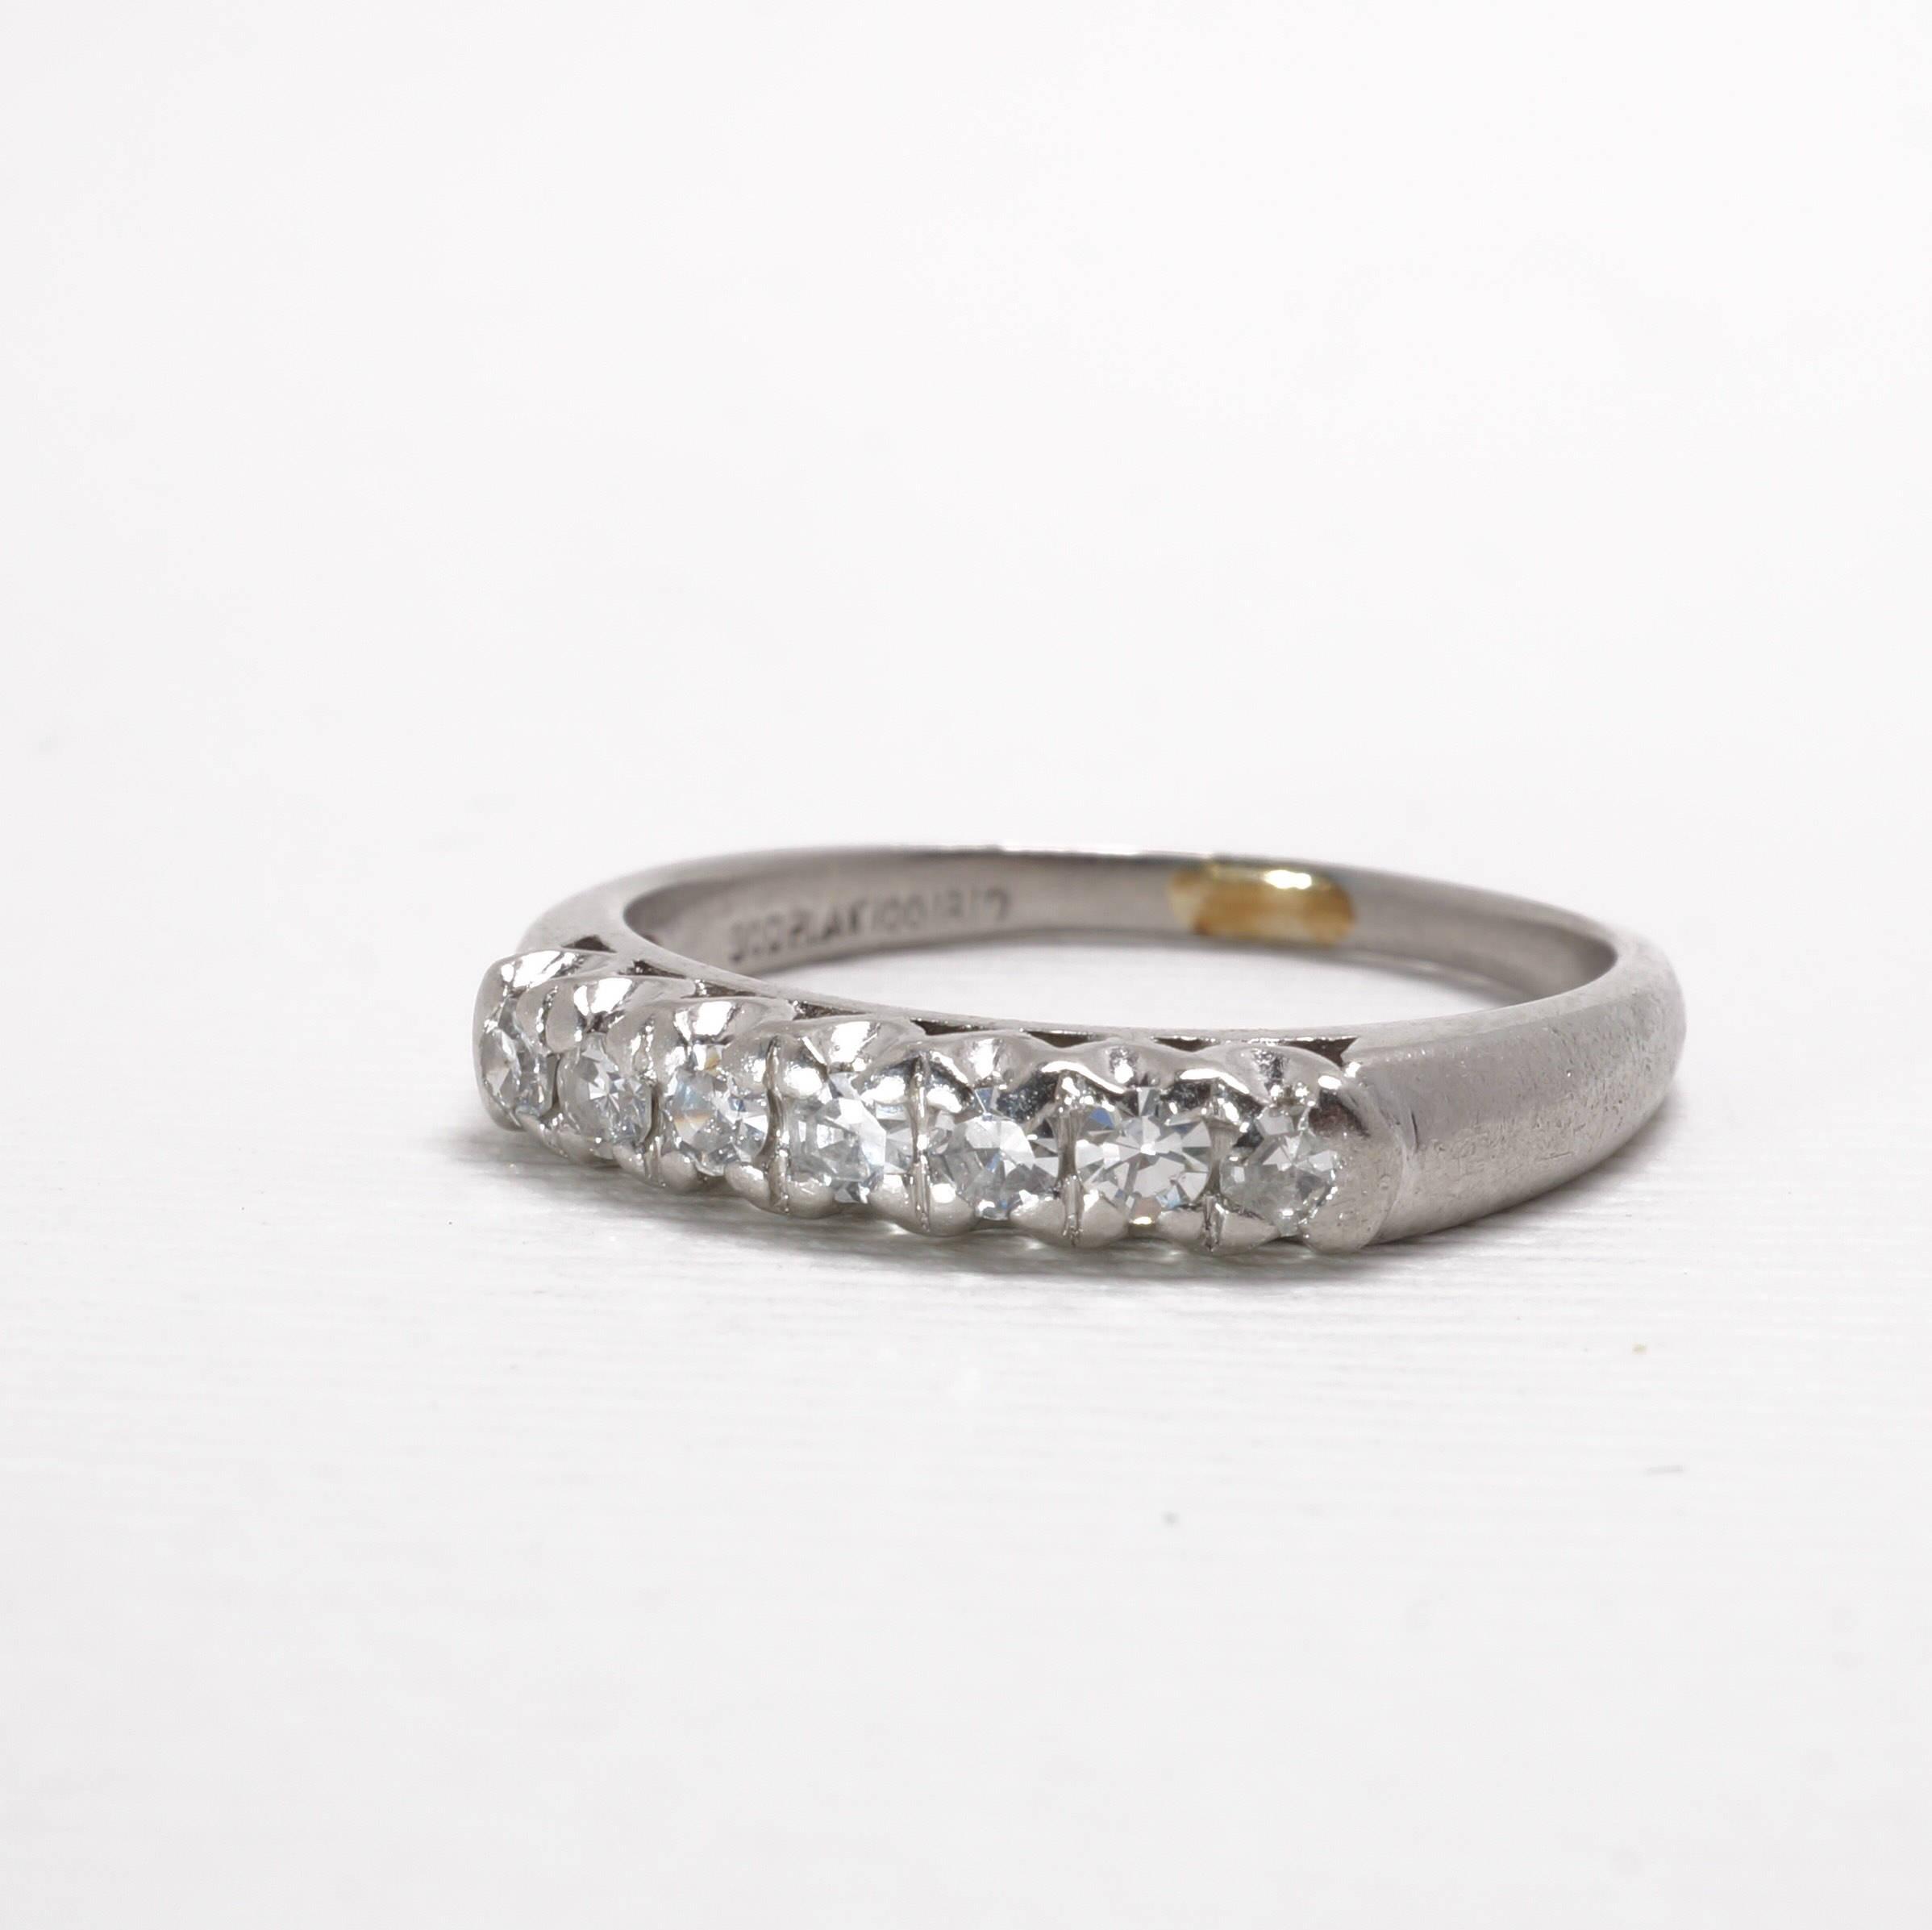 Vintage Diamond Anniversary Band | Platinum Ring | Seven Diamonds | Item  93617 Intended For Latest Diamond Anniversary Bands In Platinum (Gallery 25 of 25)